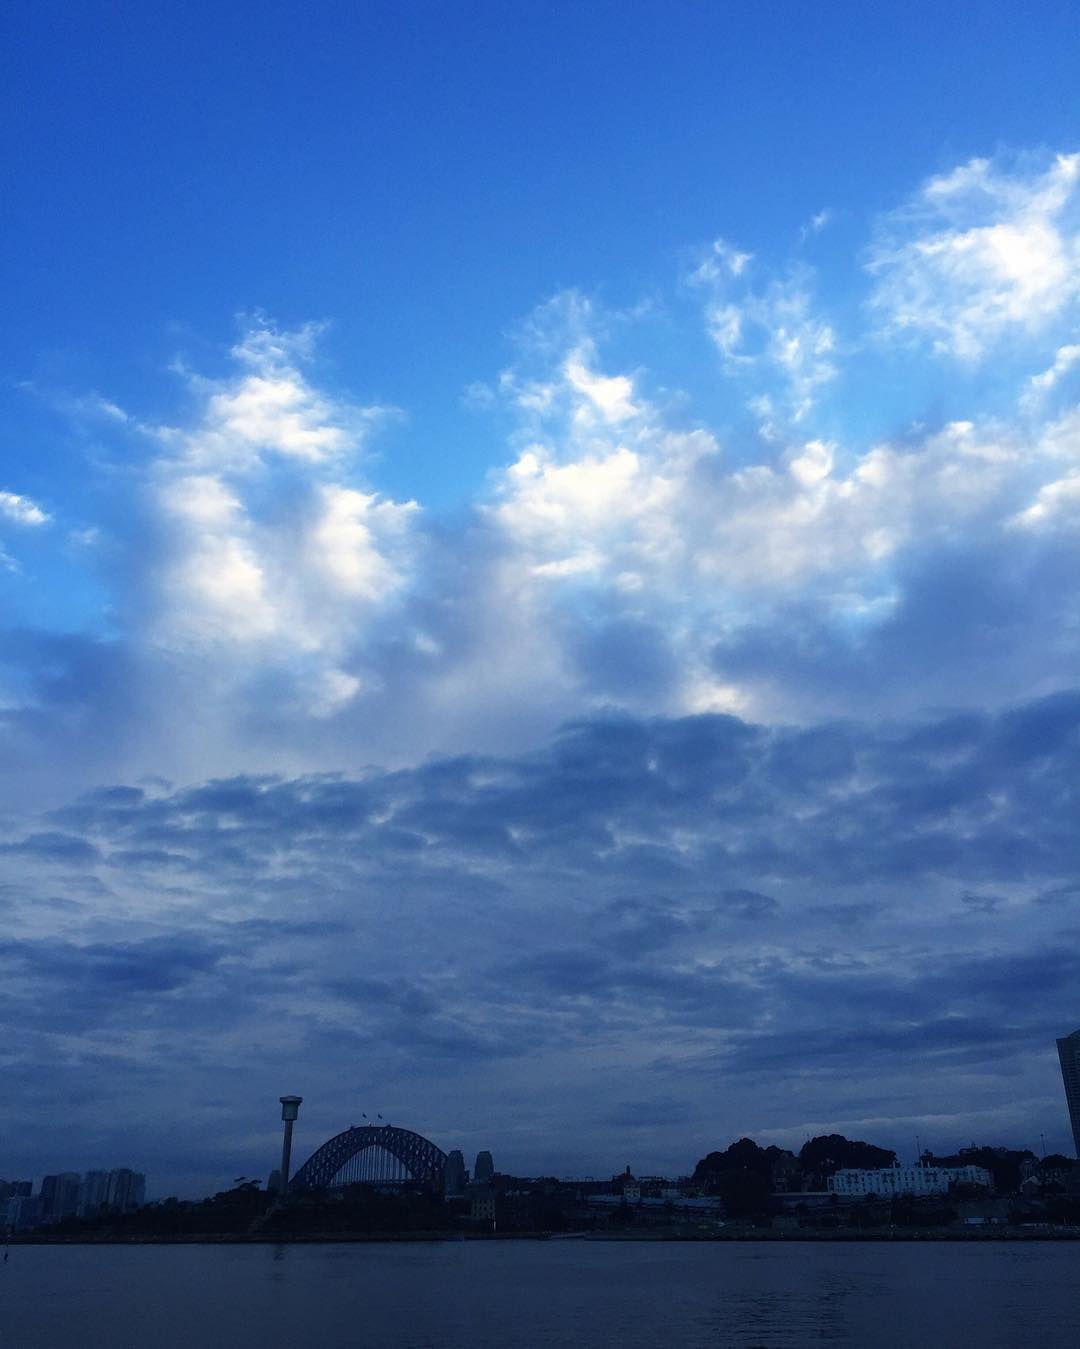 Clouds layer in harmony. #sunrise #jonesbaywharf #sydneyharbour #pyrmont #sydney #cloudporn #bluesky #thinkingofyou @mimstigram #sydneyharbourbridge #clouds #beautiful by simonwebster http://ift.tt/1NRMbNv